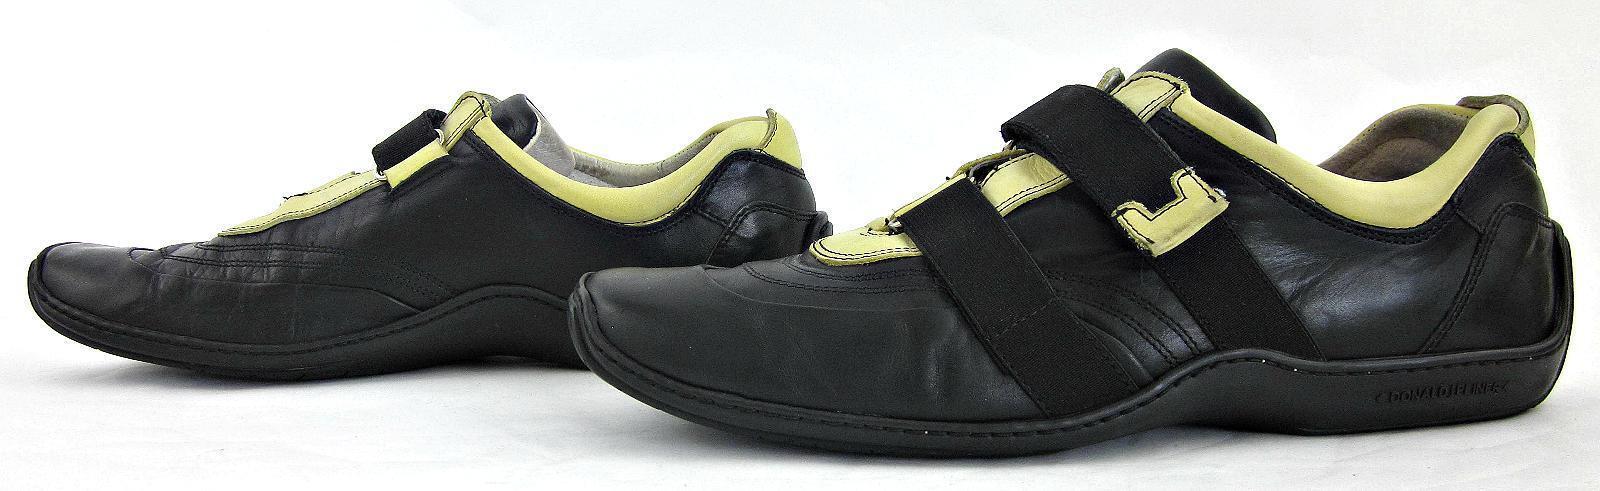 Donald J Pliner Sport Light Espaci Driving Loafers Black Light Sport Yellow 10 Fits 10.5 30c52d